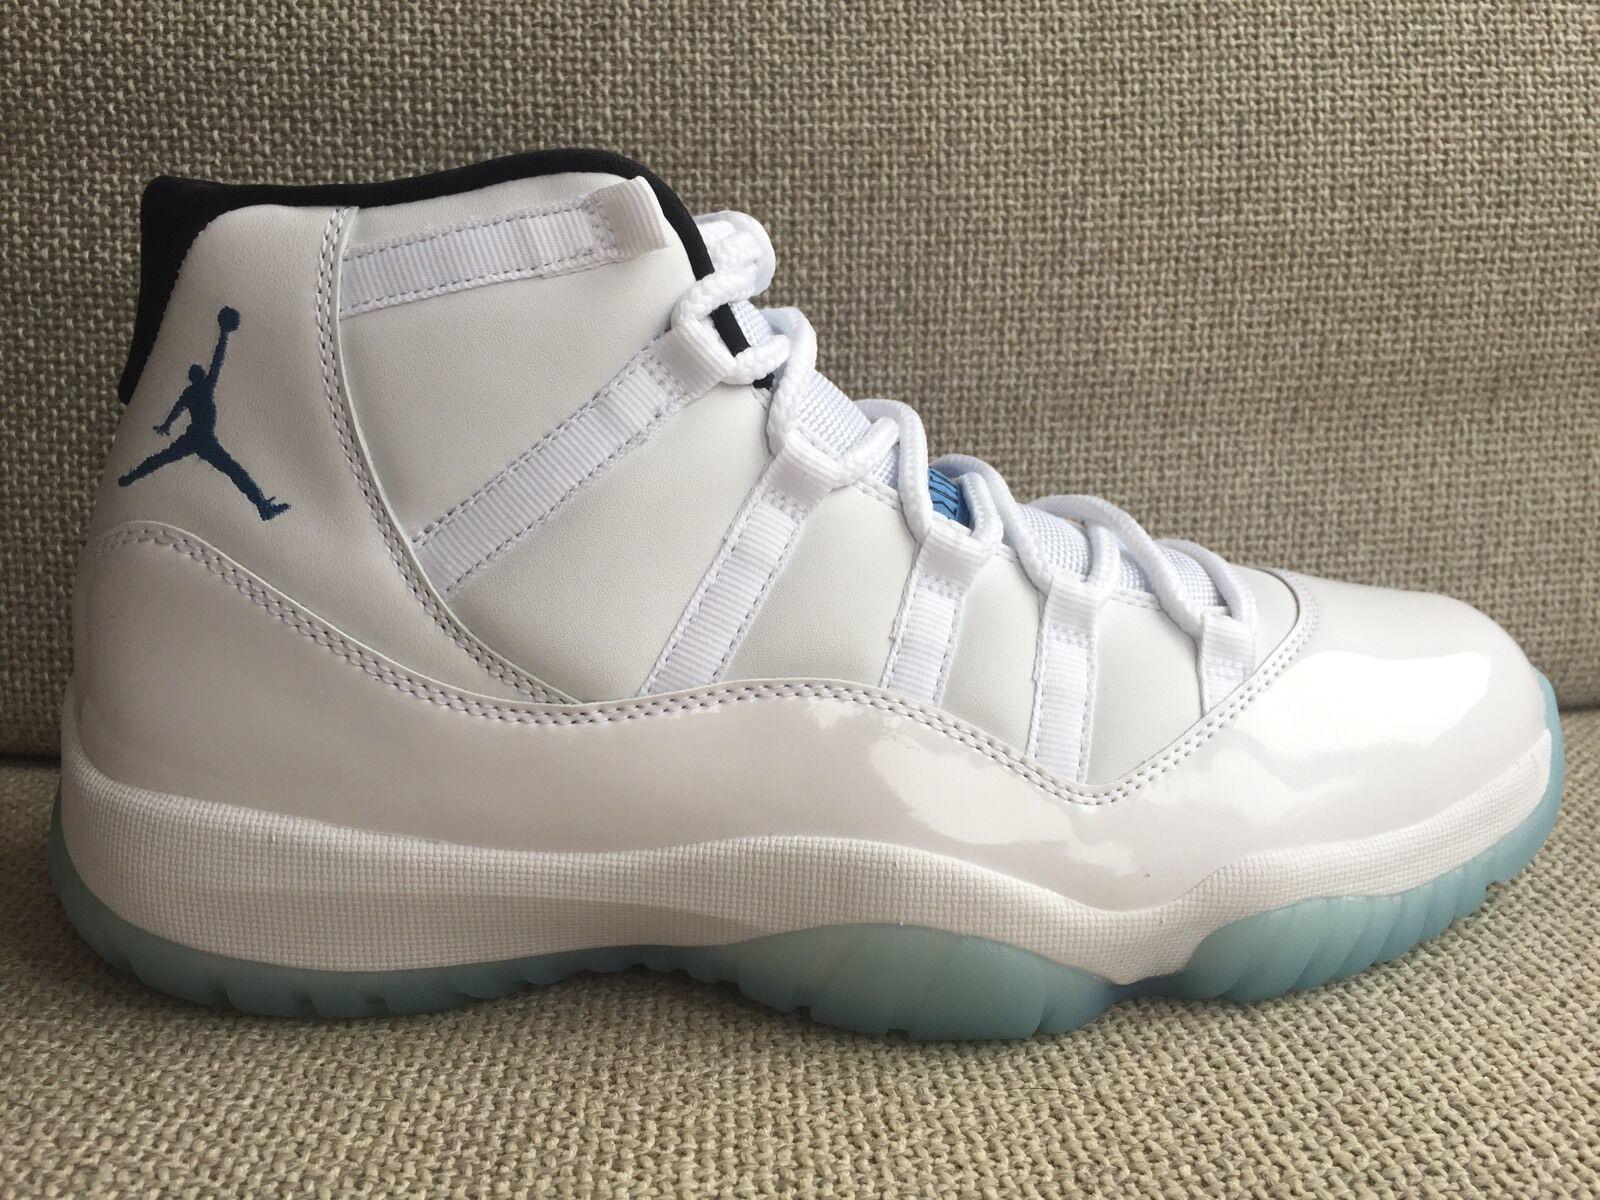 Nike Air Jordan XI 11 Retro Legend Blue/White 2014 Size 10.5 DS 378037-117